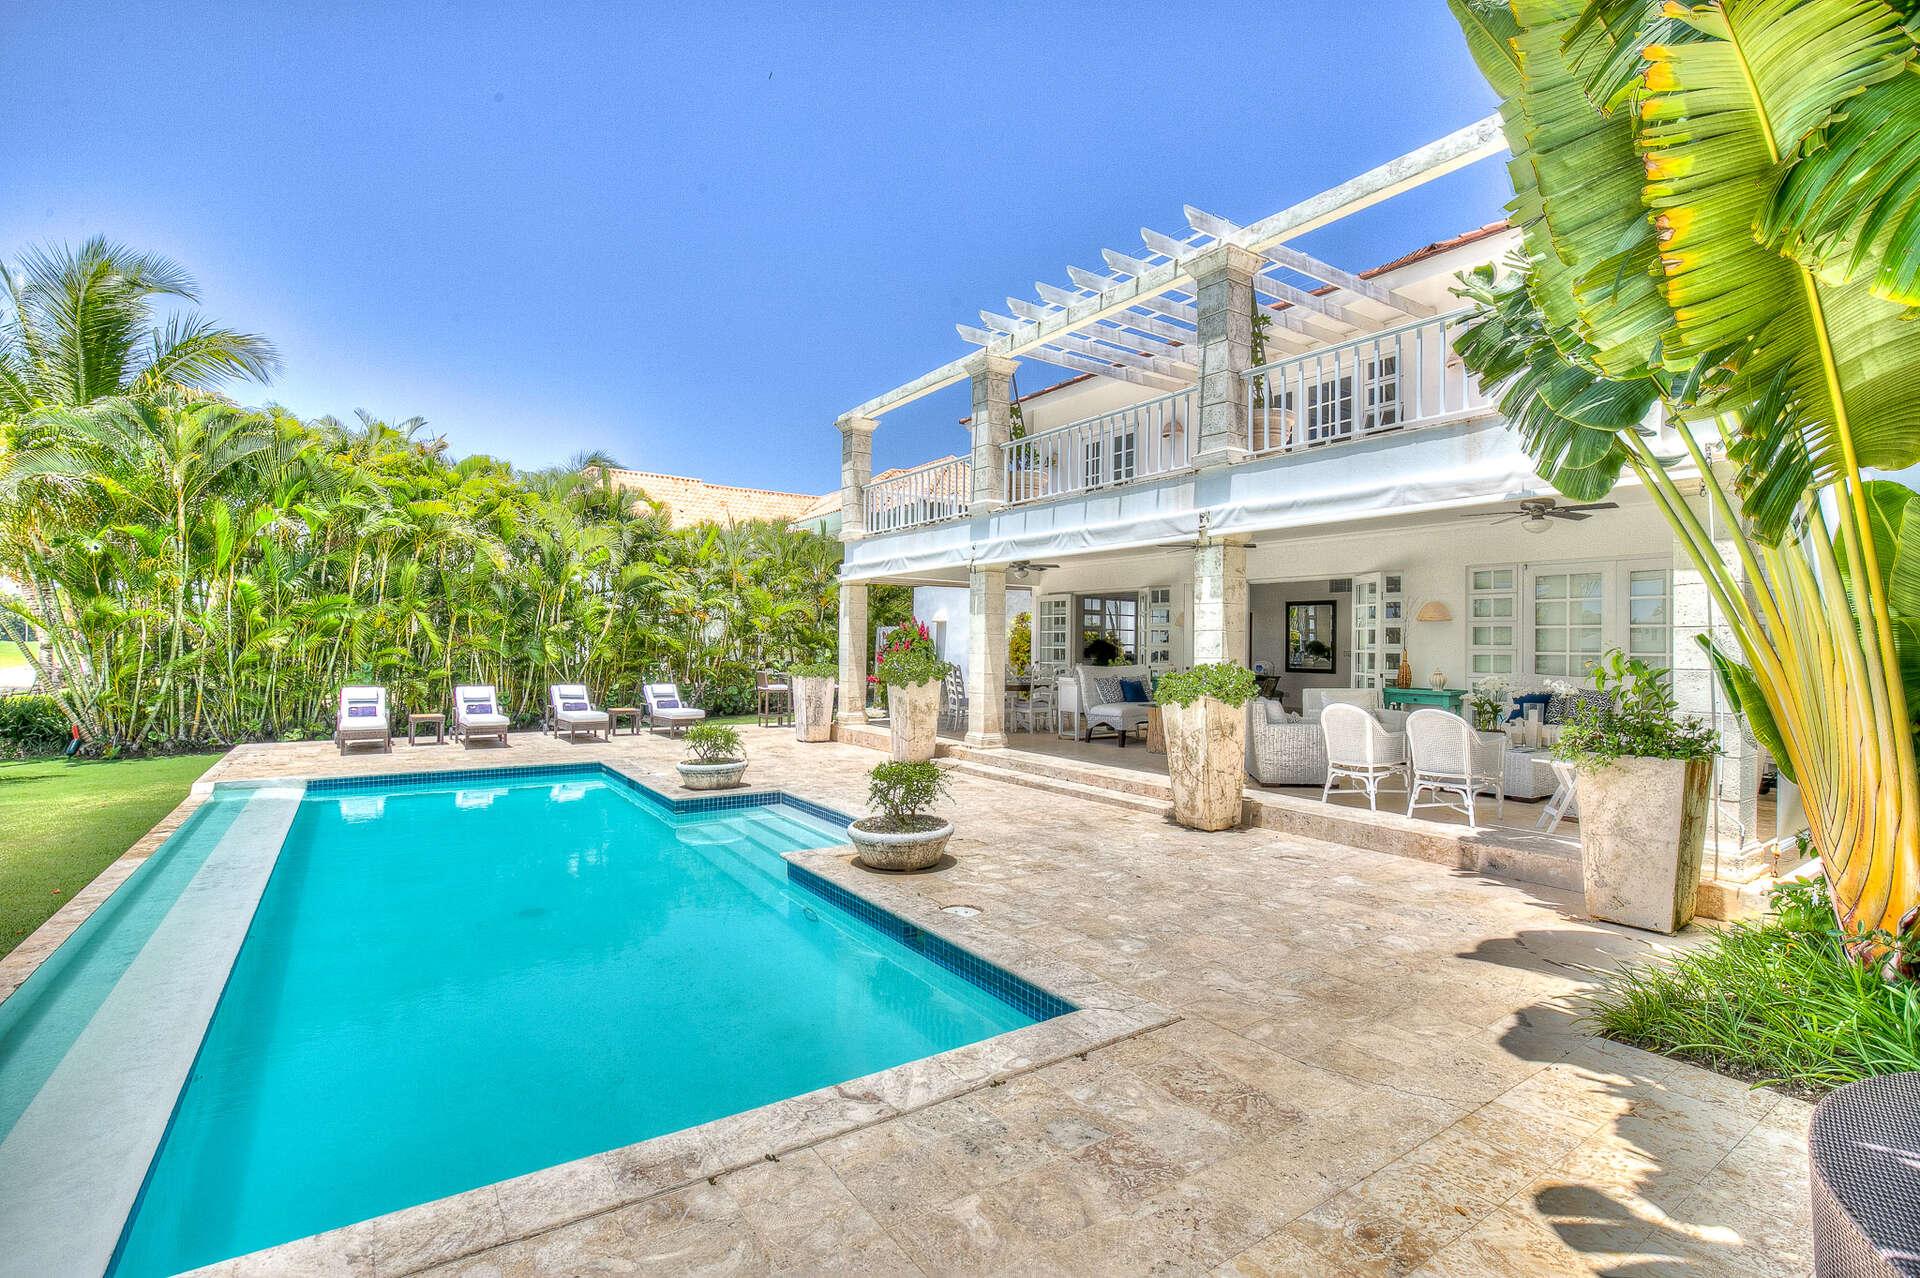 Luxury villa rentals caribbean - Dominican republic - Punta cana - Punta cana resort and club - Tortuga B10 - Image 1/30